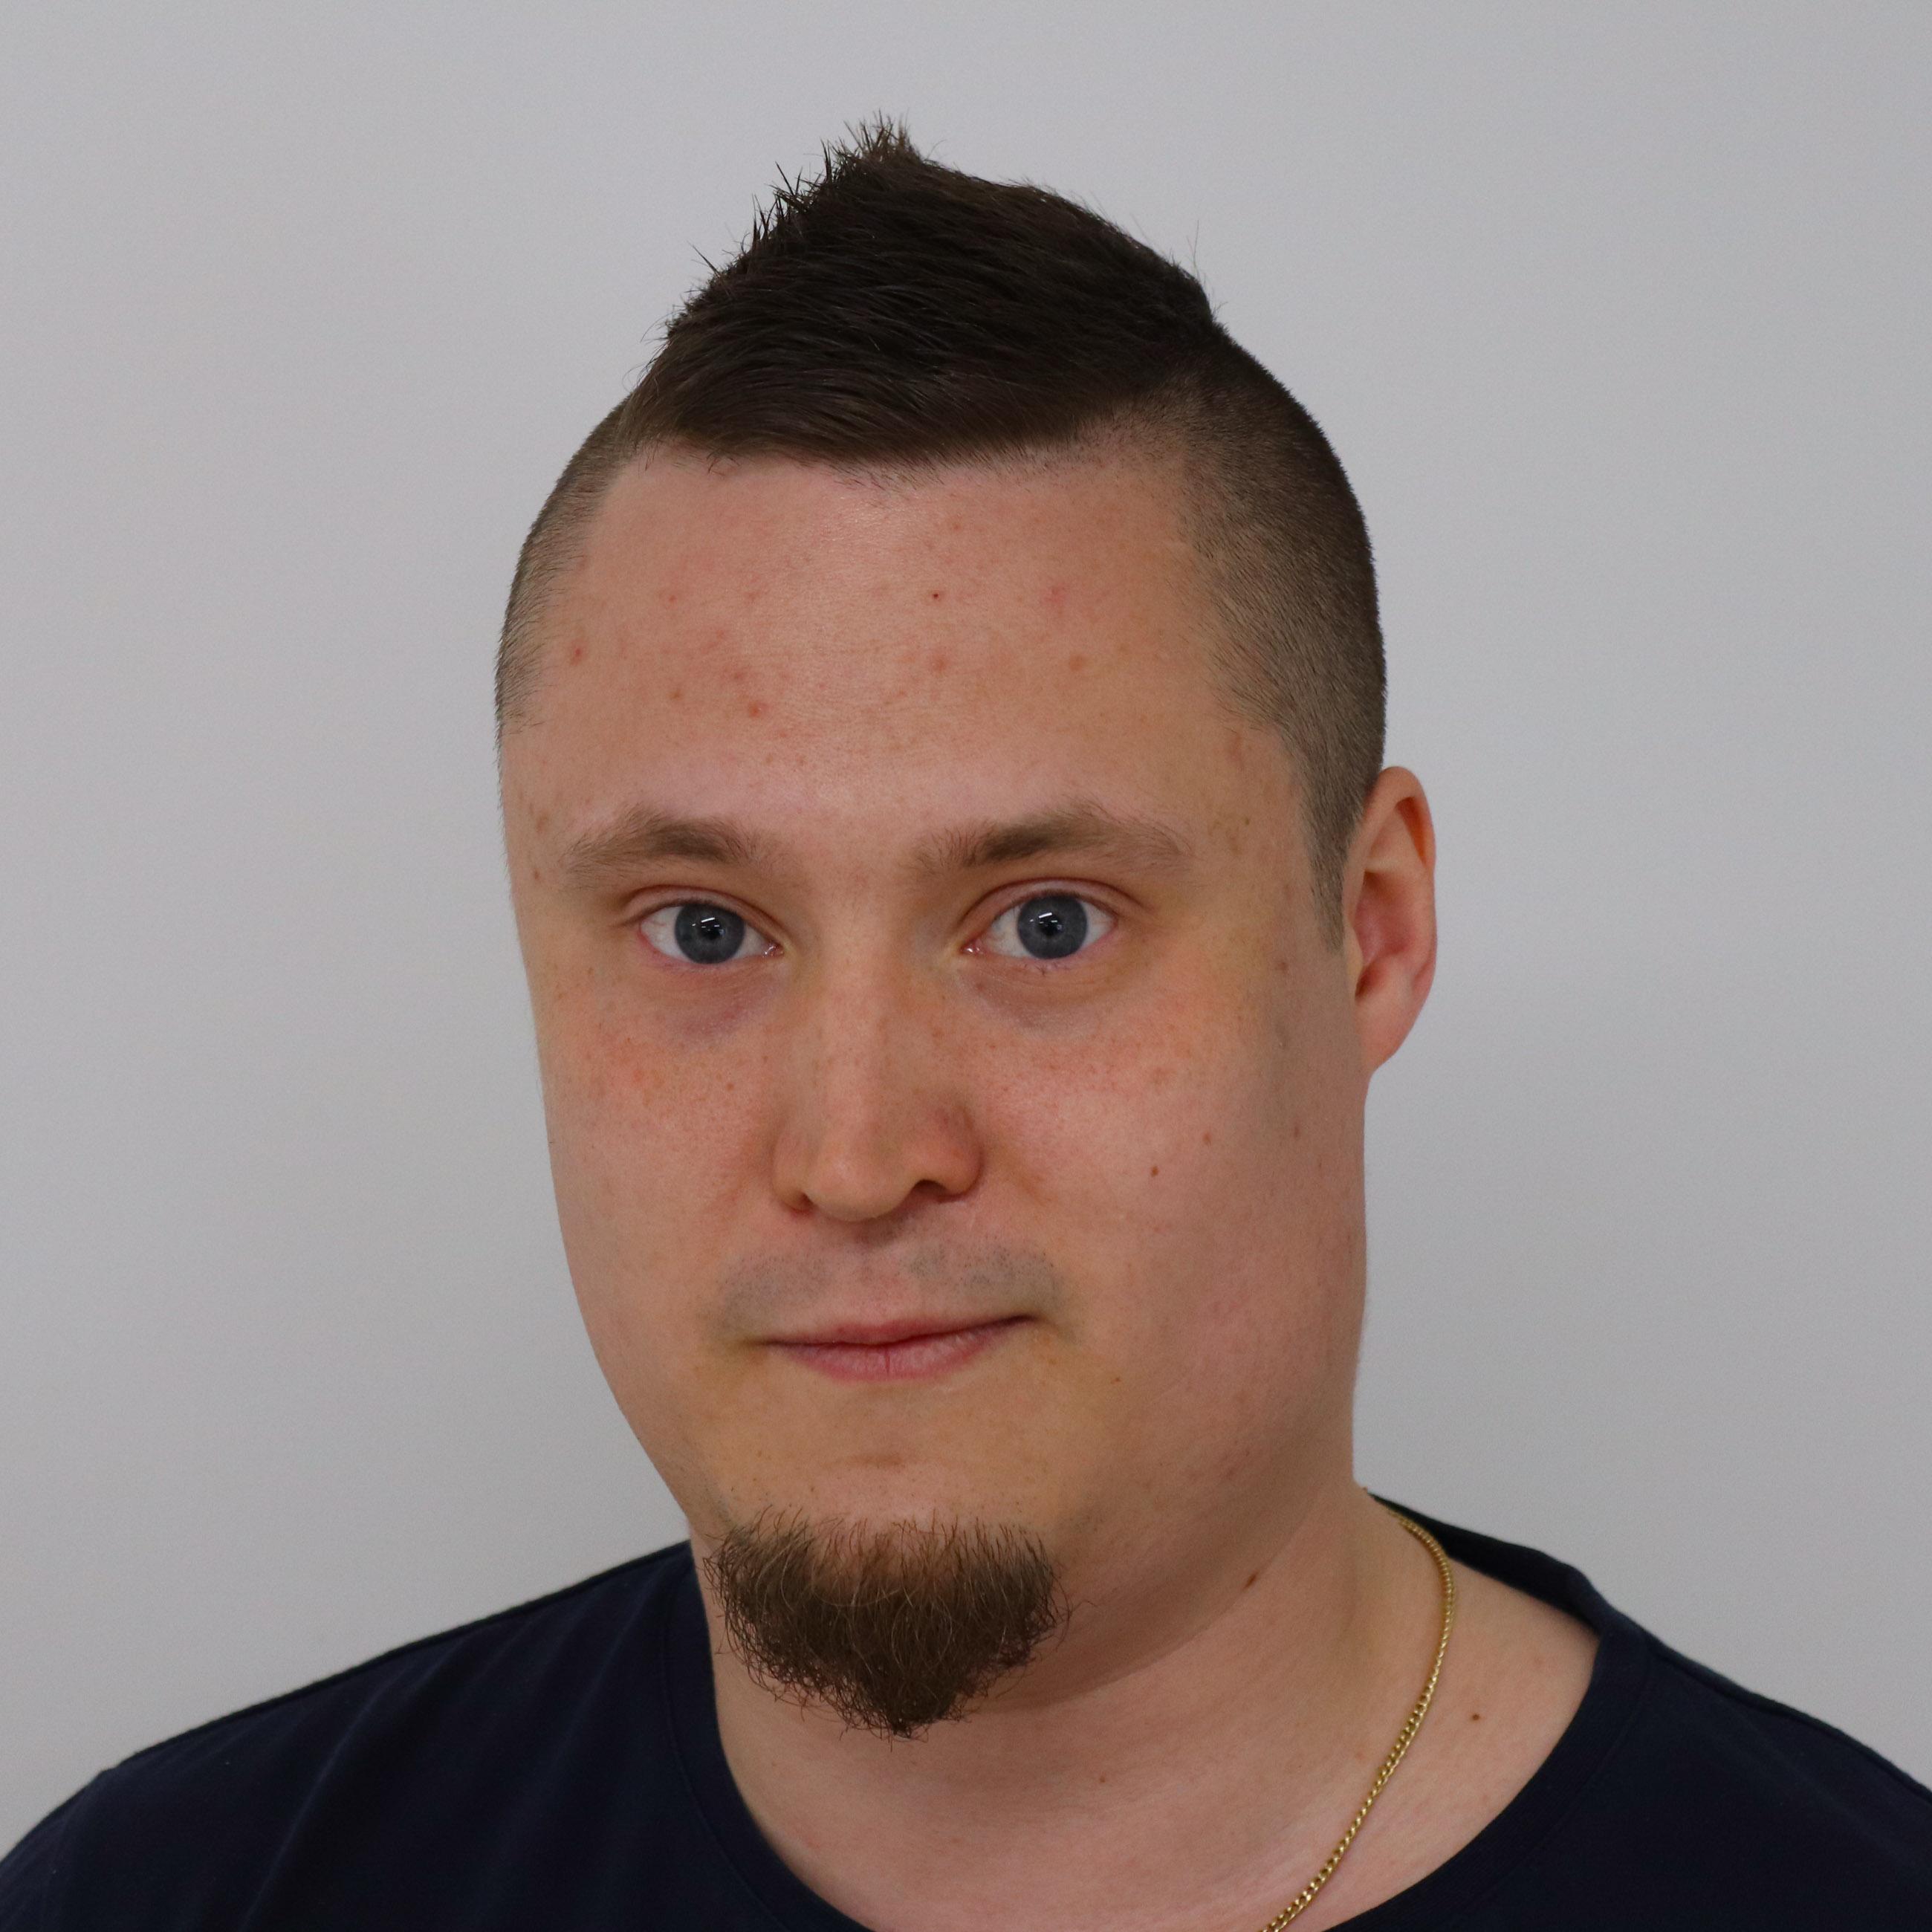 Valtteri Hienonen